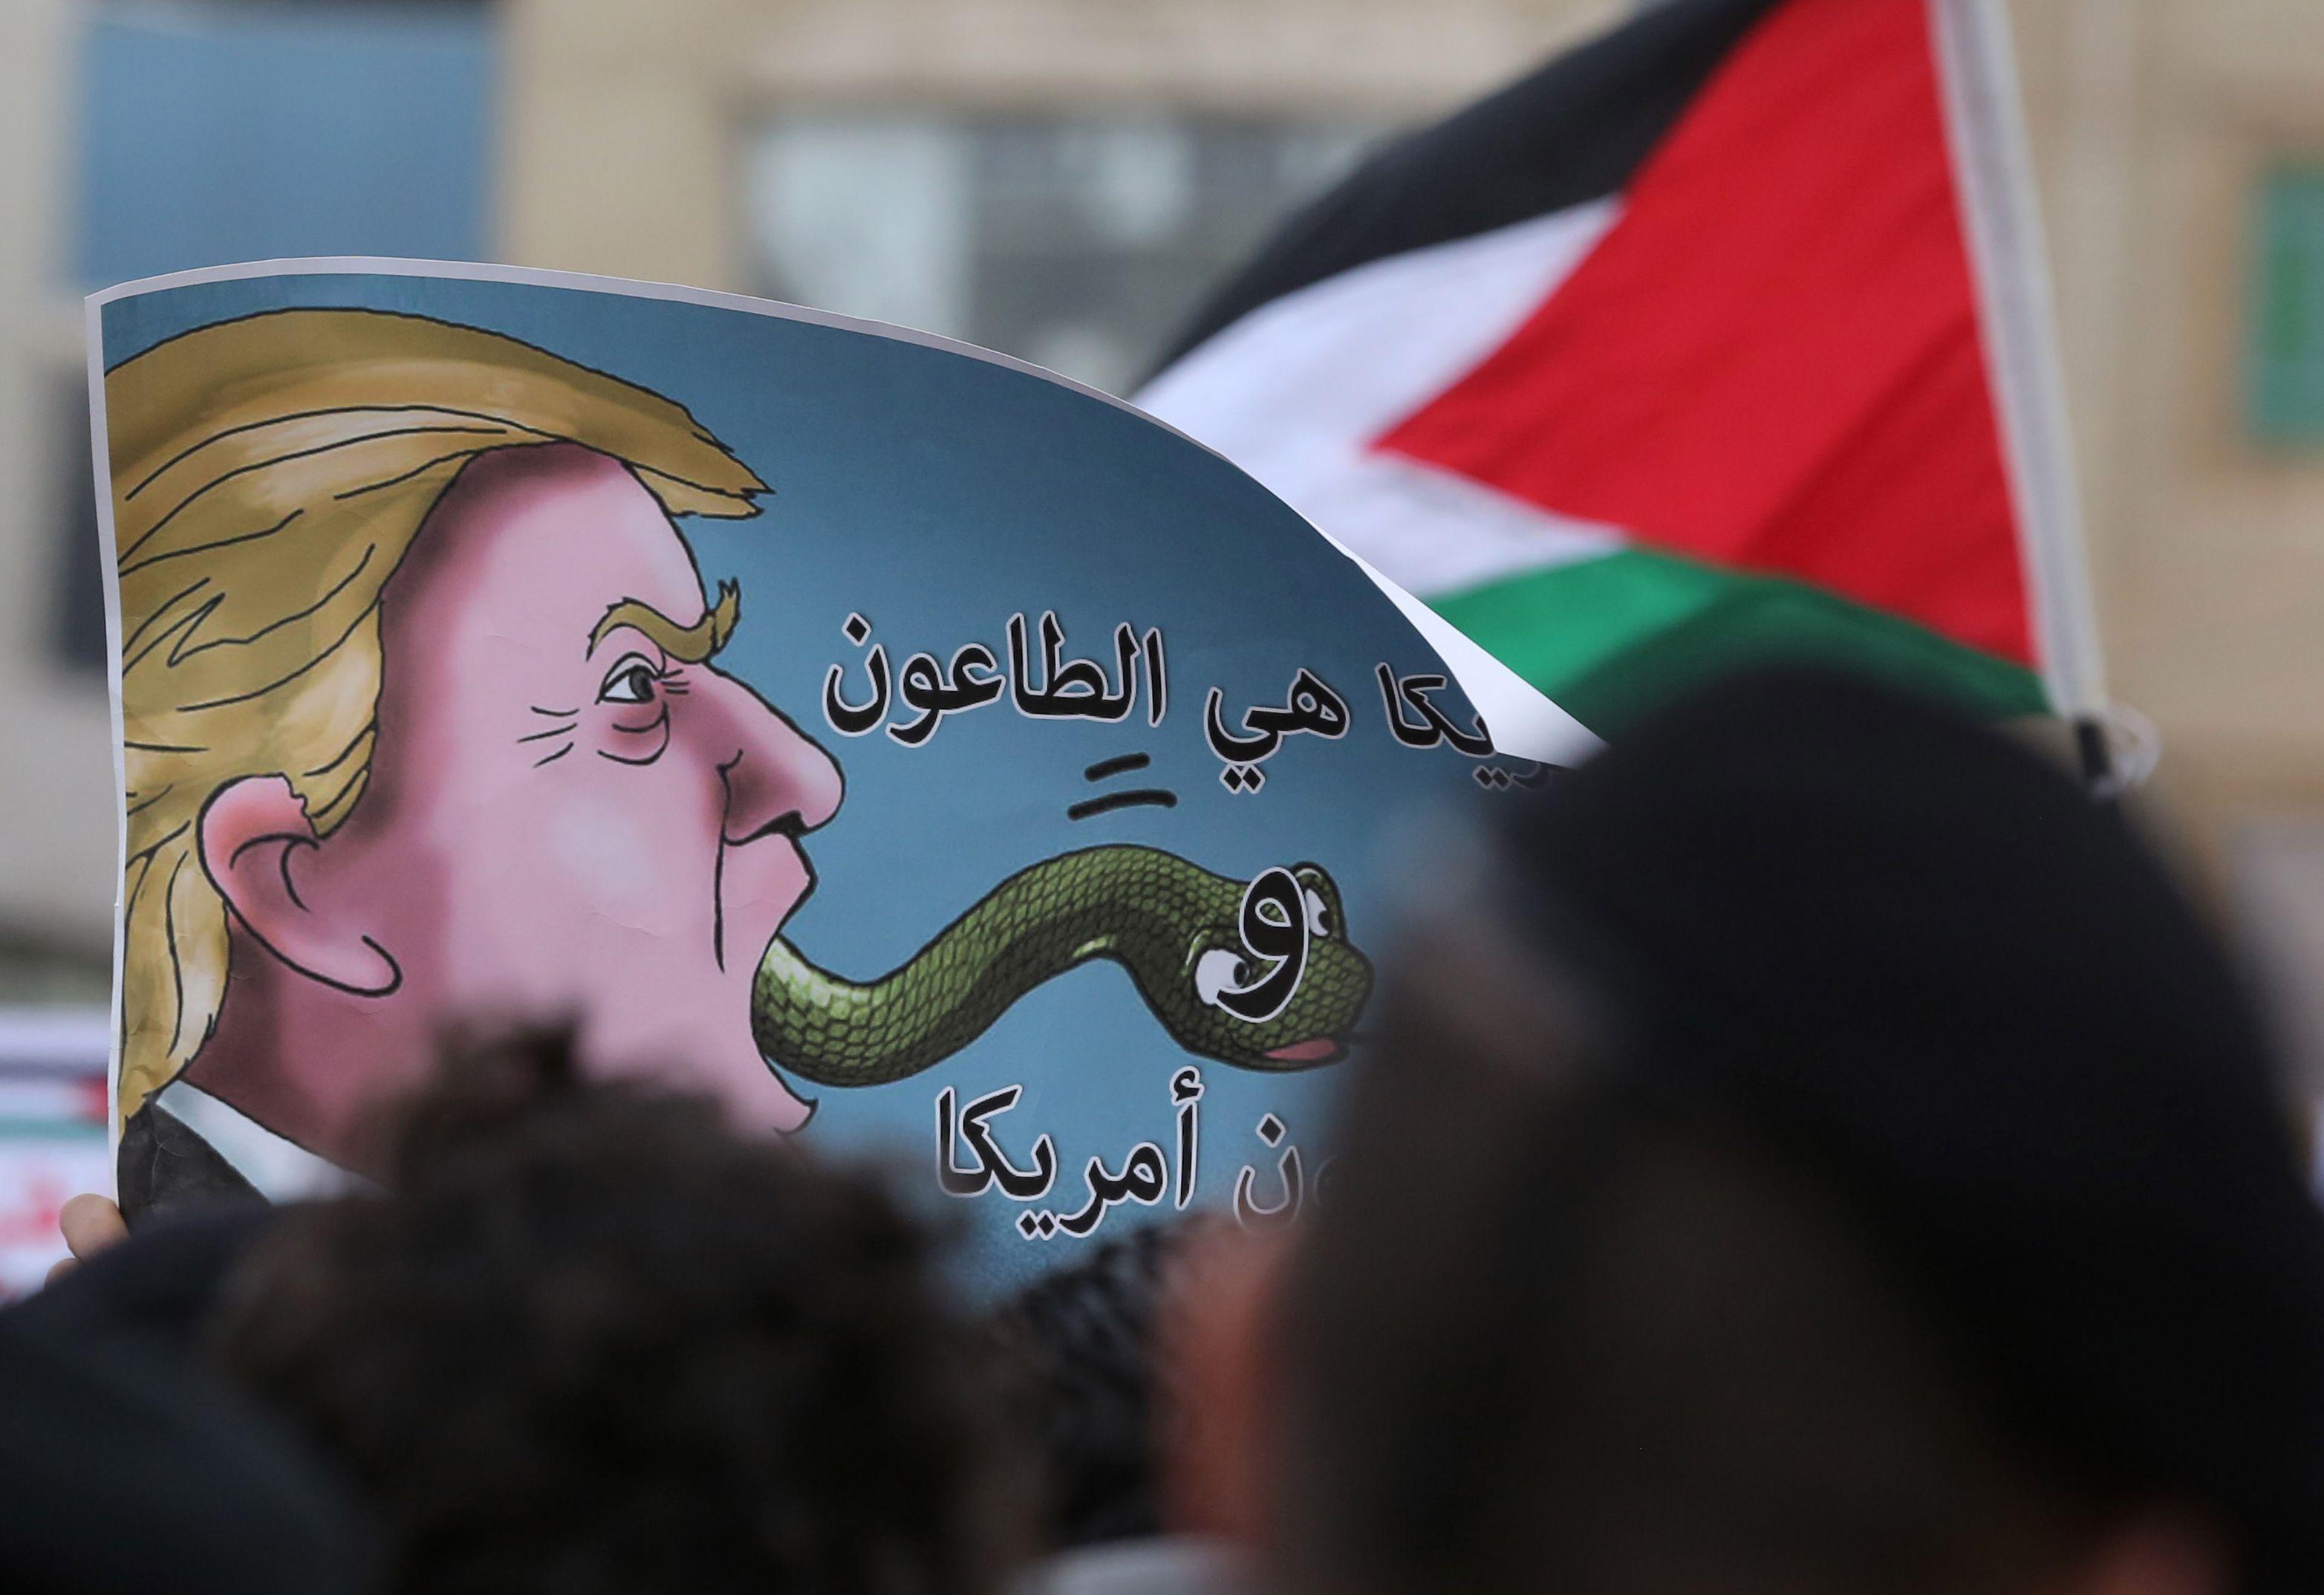 تظاهر مواطنو تونس دعما للقدس